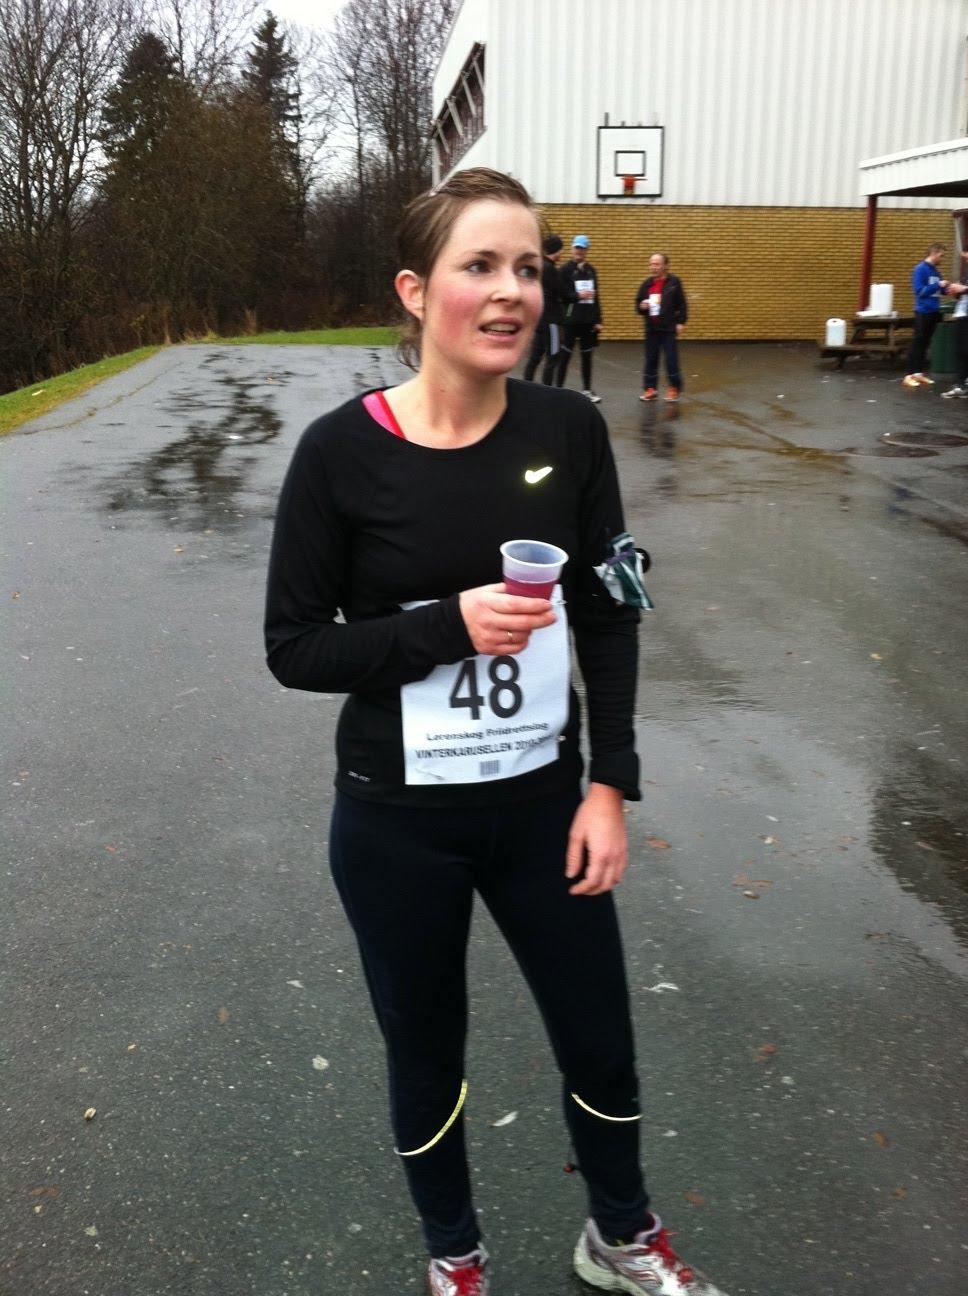 Lørenskog Maraton